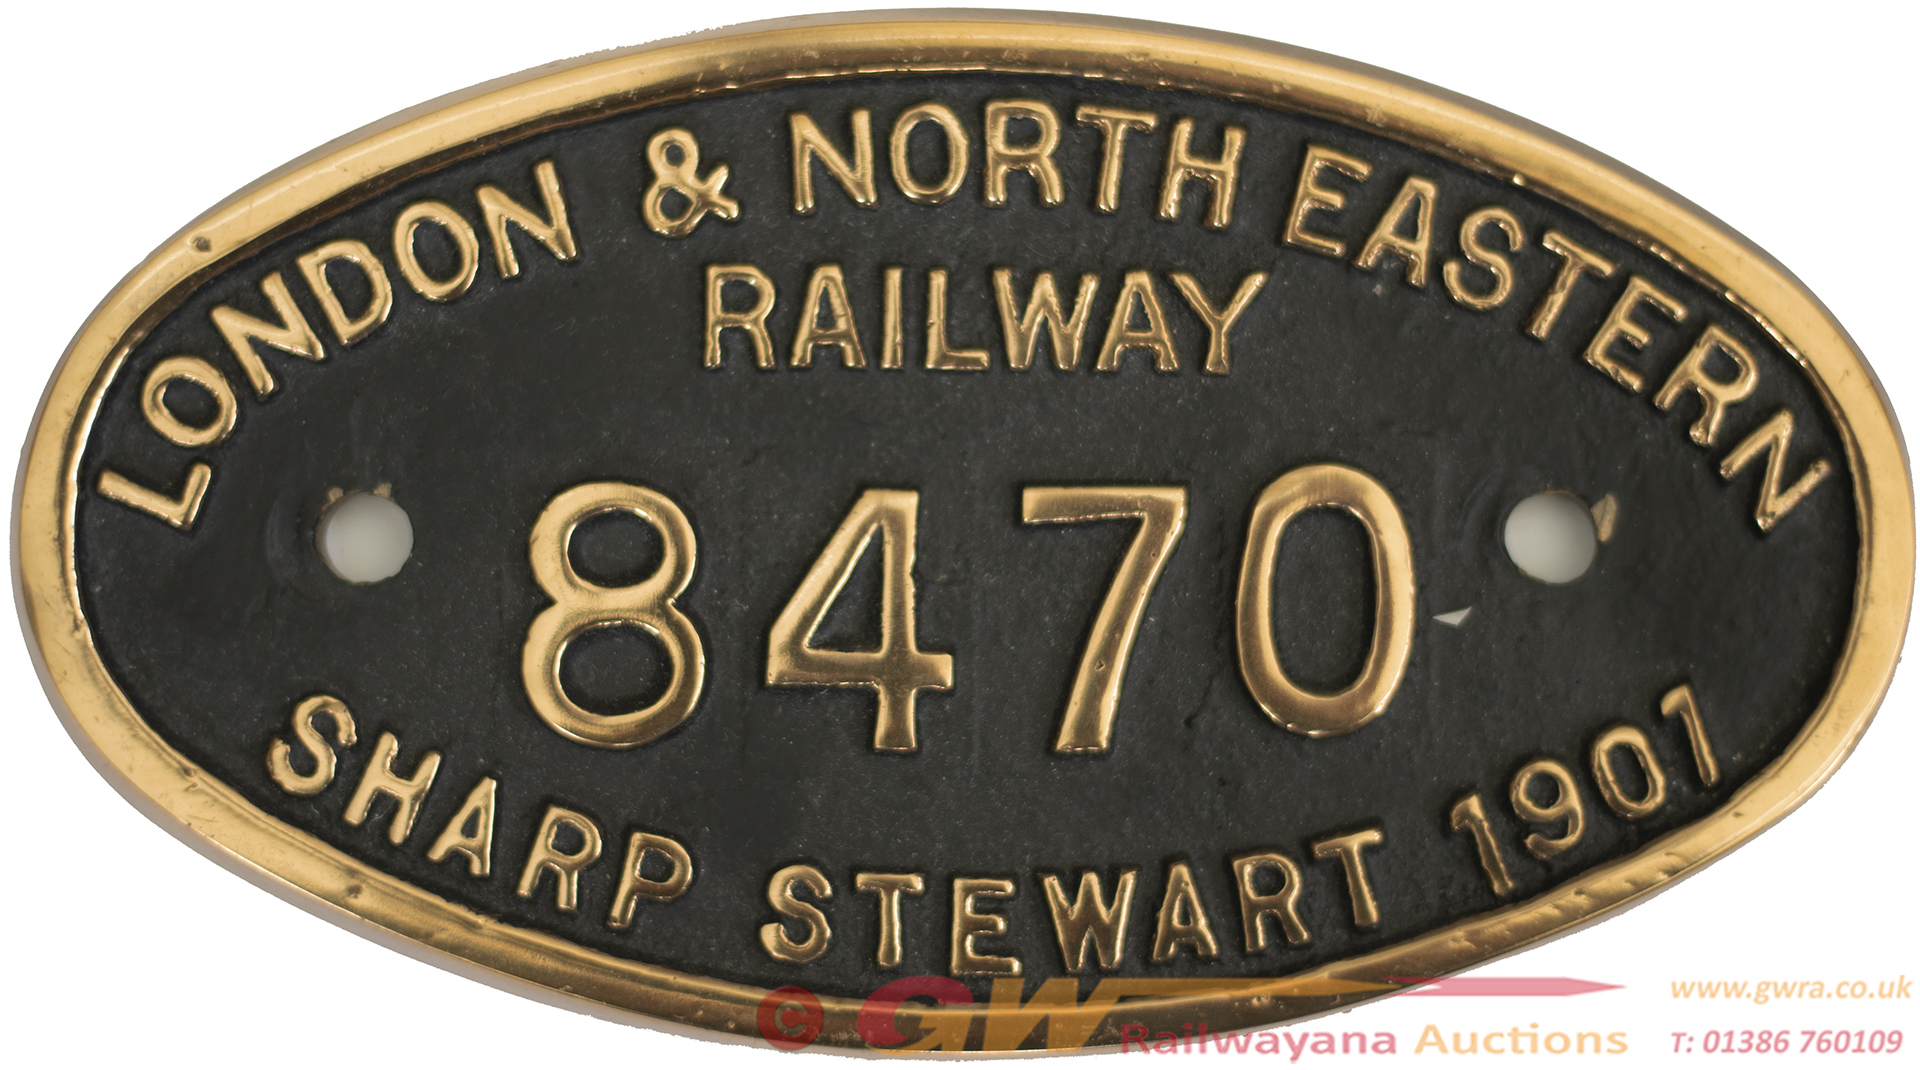 Worksplate LONDON & NORTH EASTERN RAILWAY SHARP